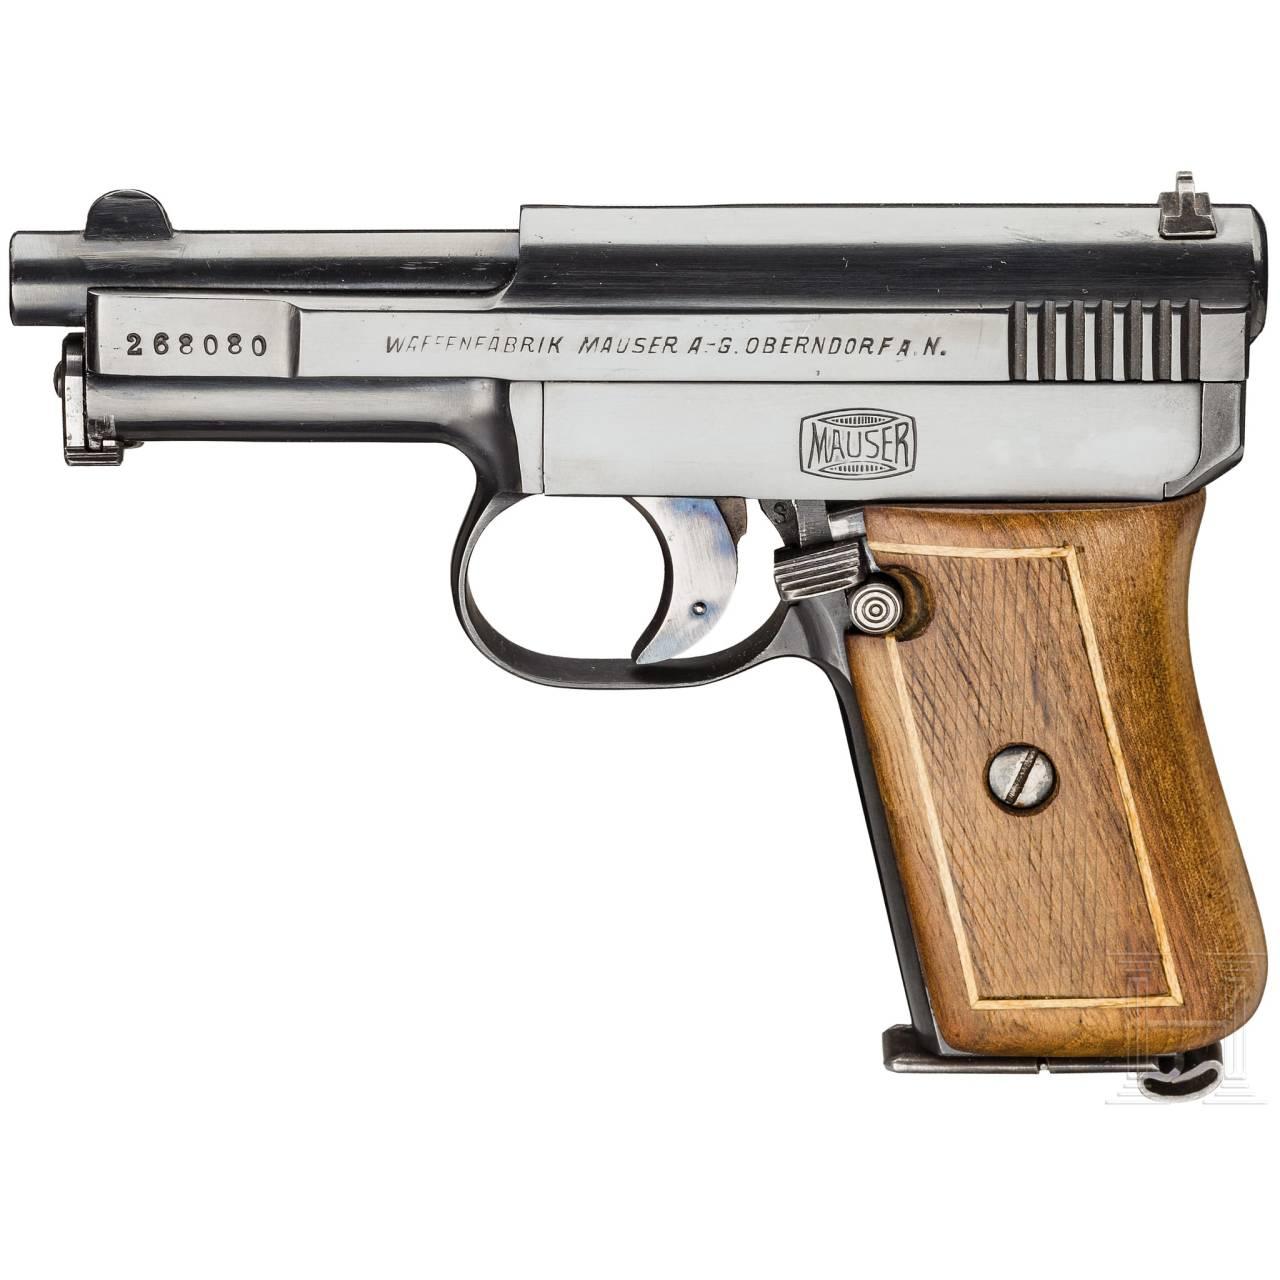 Mauser Mod. 1910, Portugalkontrakt